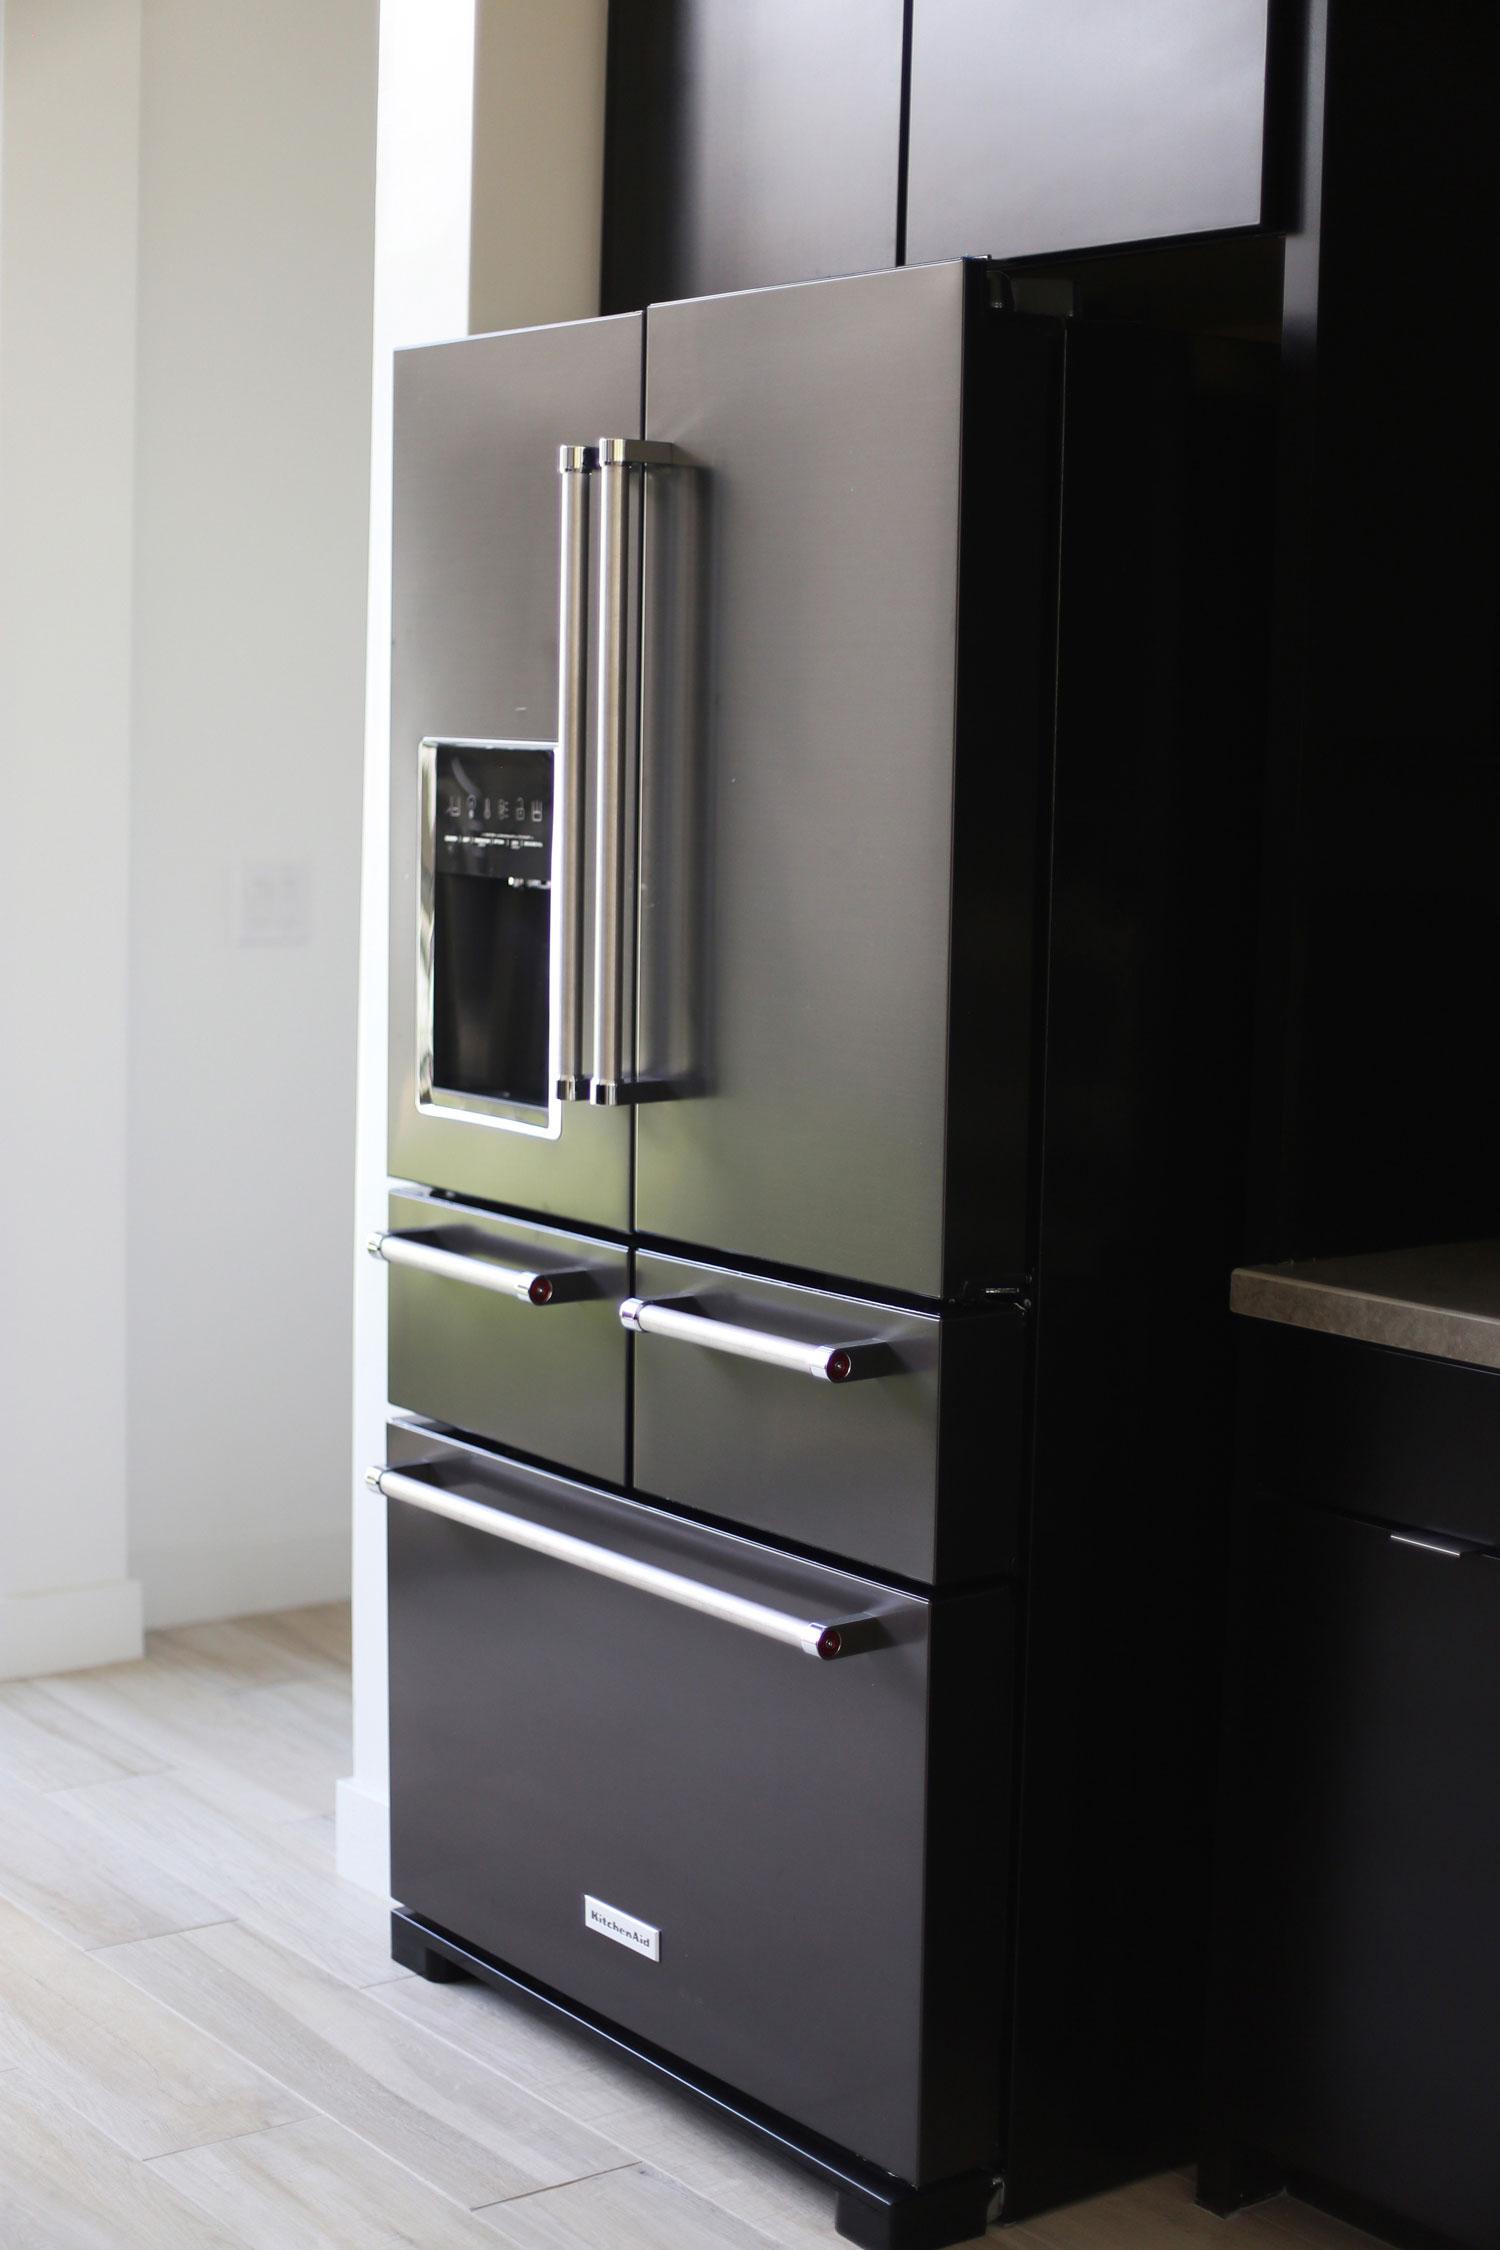 KitchenAid black stainless steel 5 drawer refrigerator